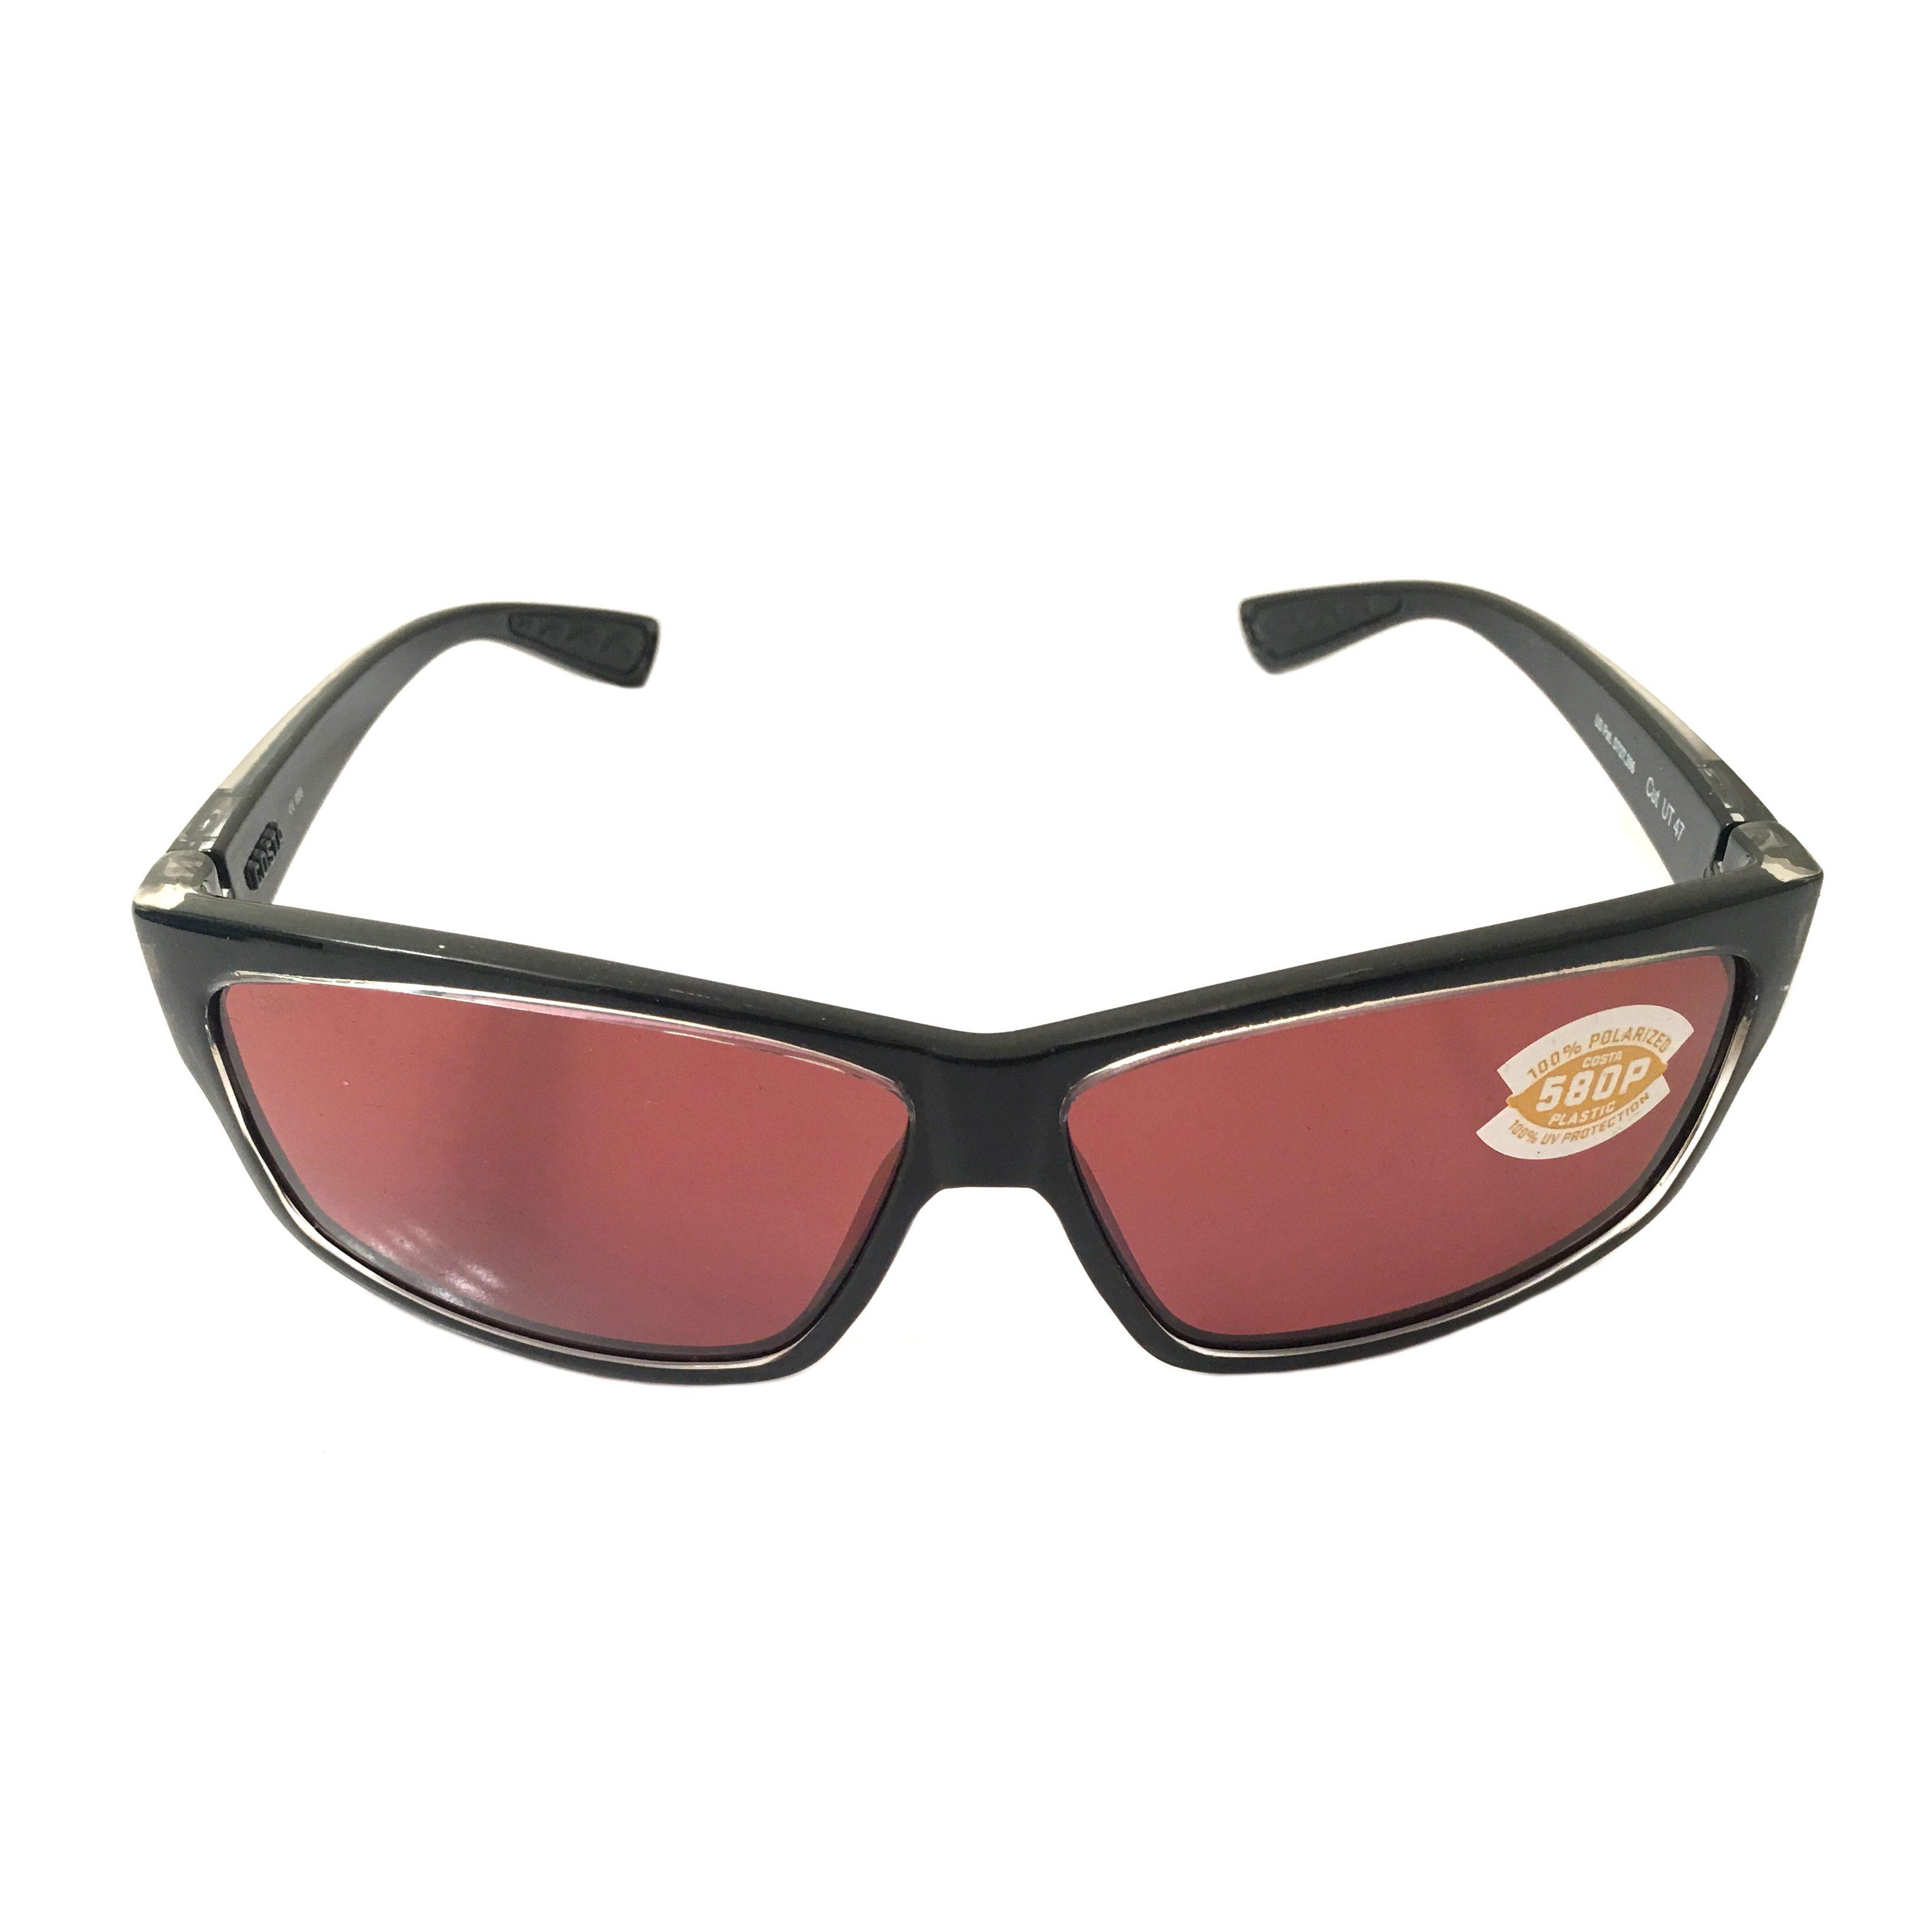 Costa Del Mar Cut Sunglasses Black Clear Squall Frame